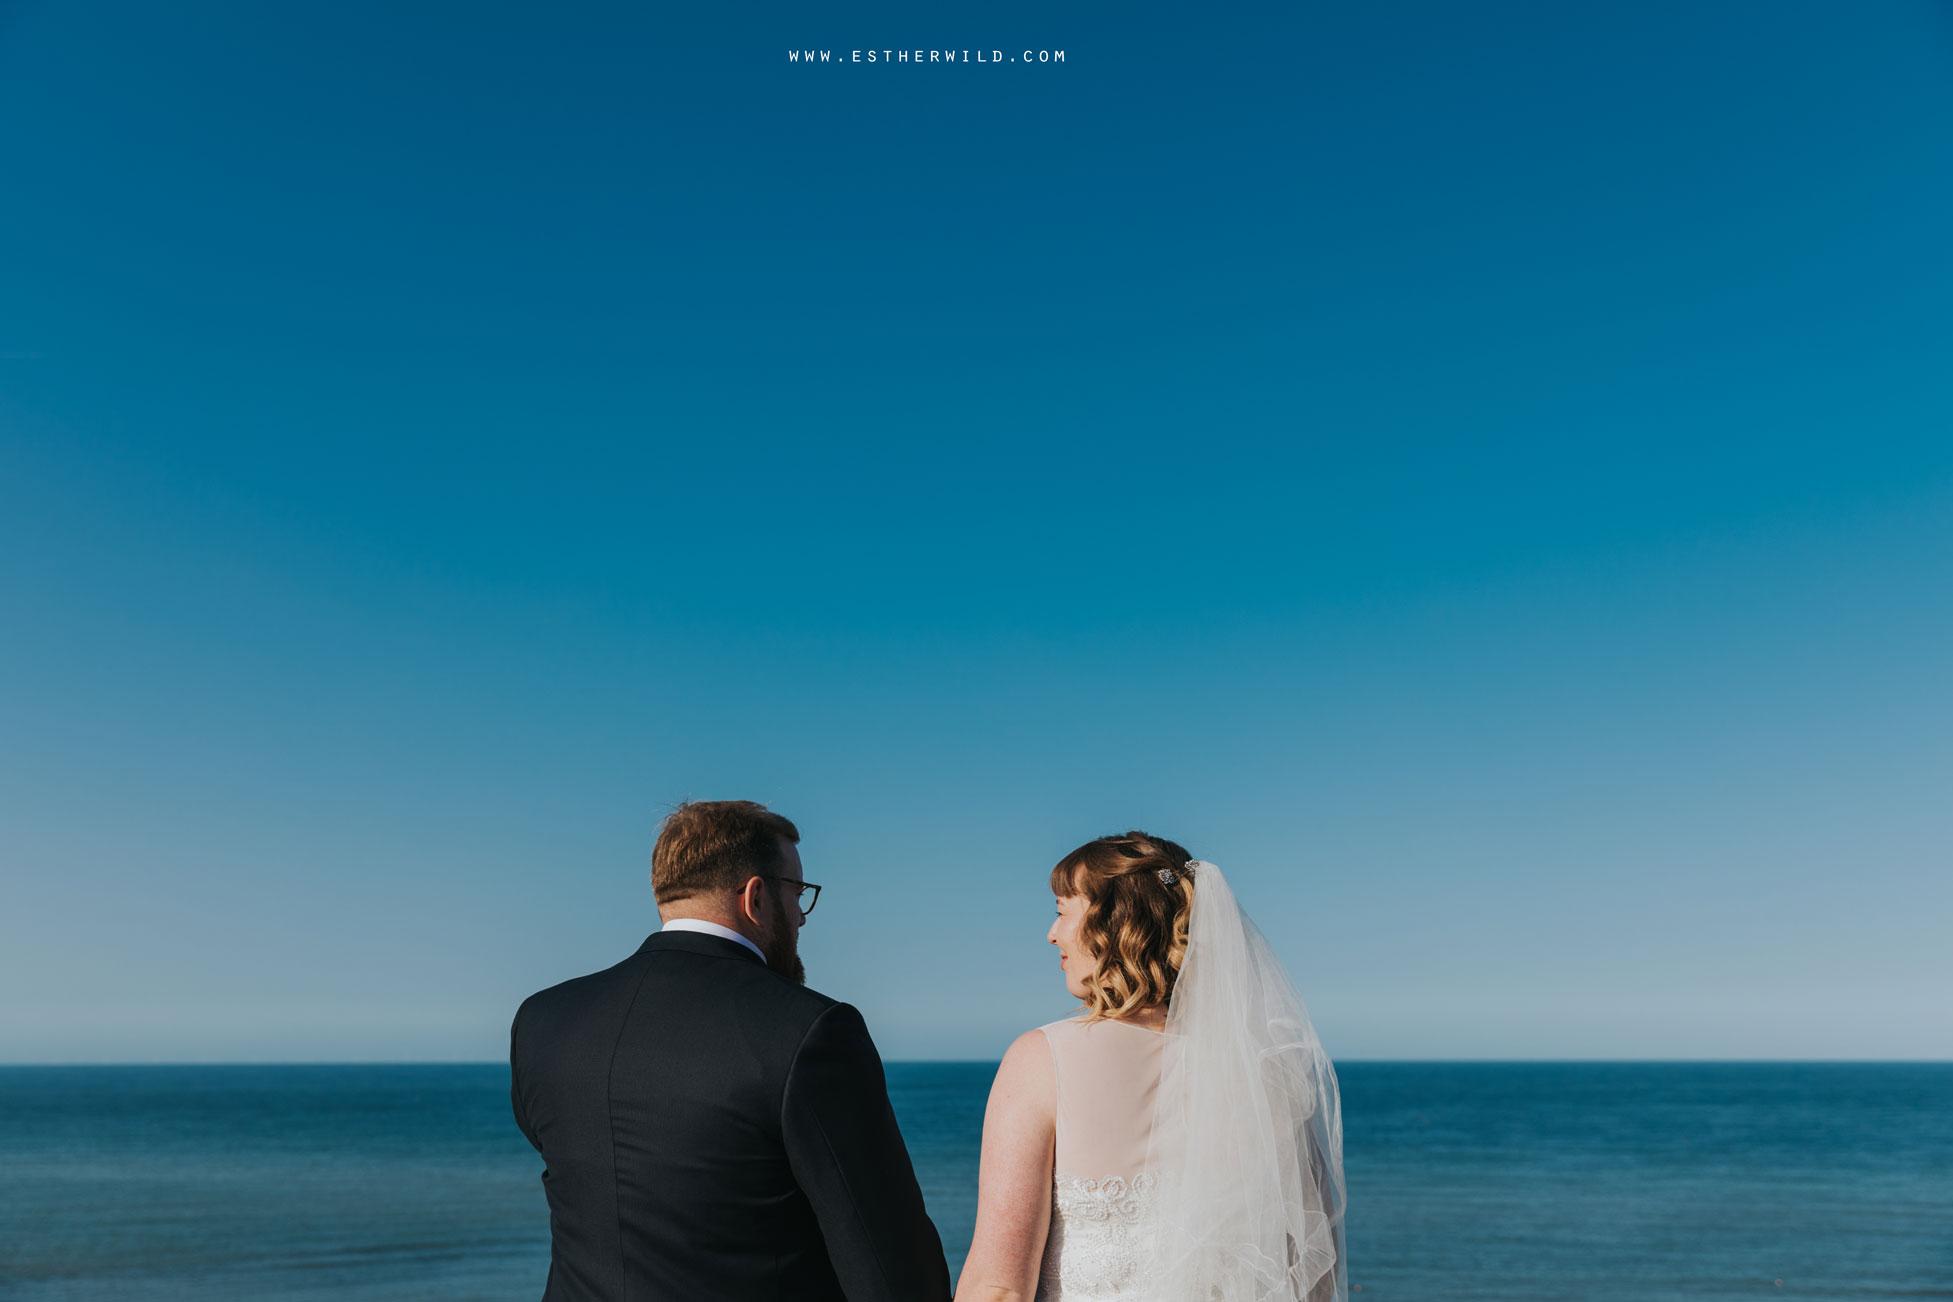 Cromer_Wedding_Beach_Outdoor_Ceremony_Norfolk_North_Lodge_Registry_Office_Rocket_House_Cafe_Cromer_Pier_IMG_4522.jpg